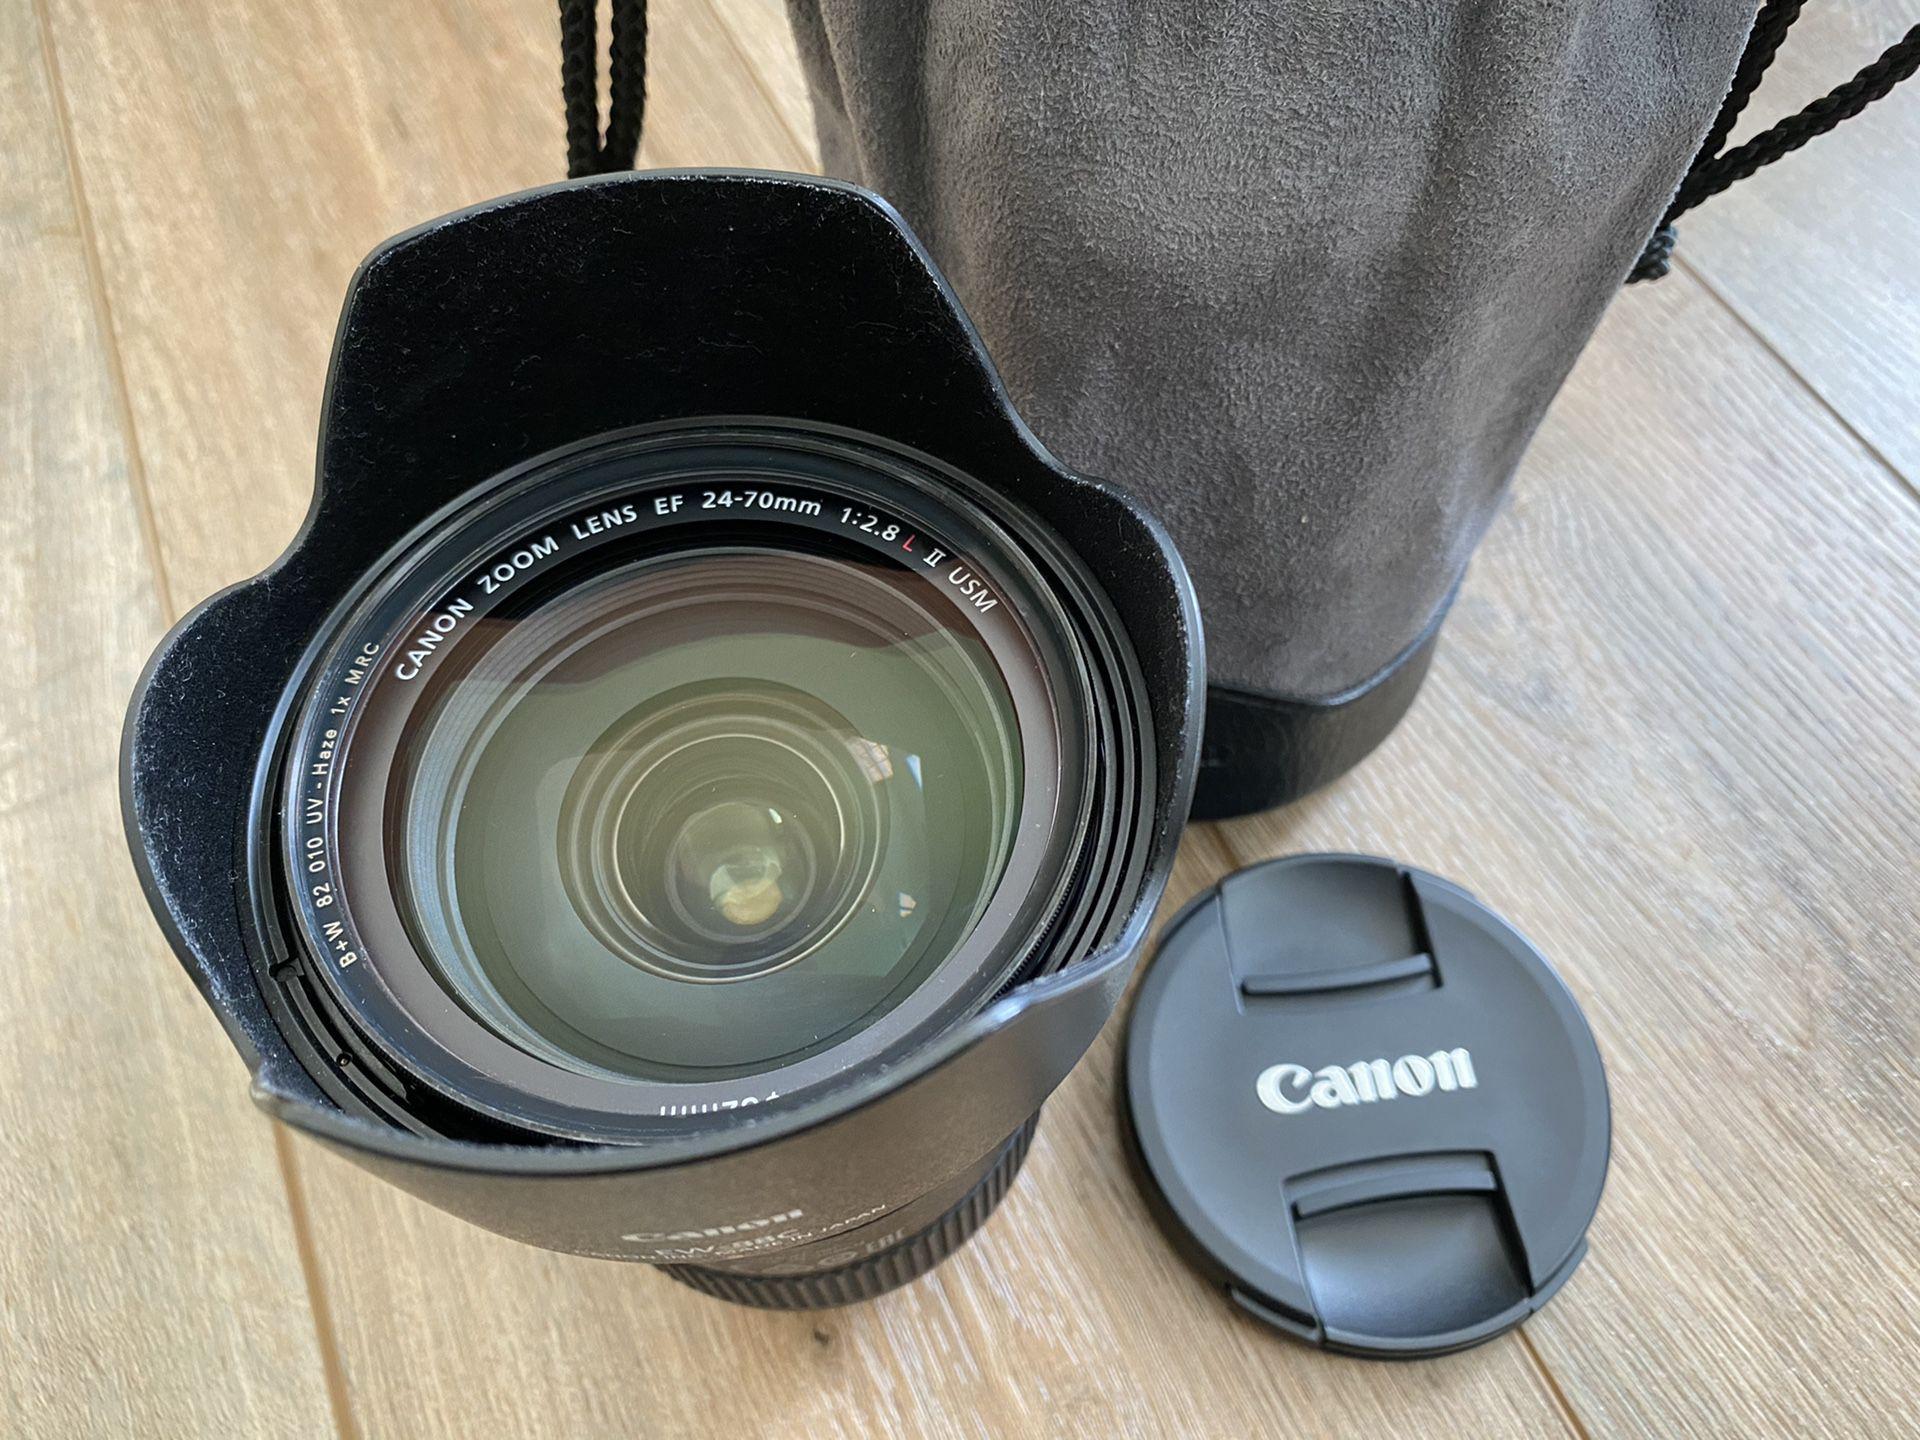 Canon EF 24-70mm F/2.8L II USM Prime Lens With B+W UV